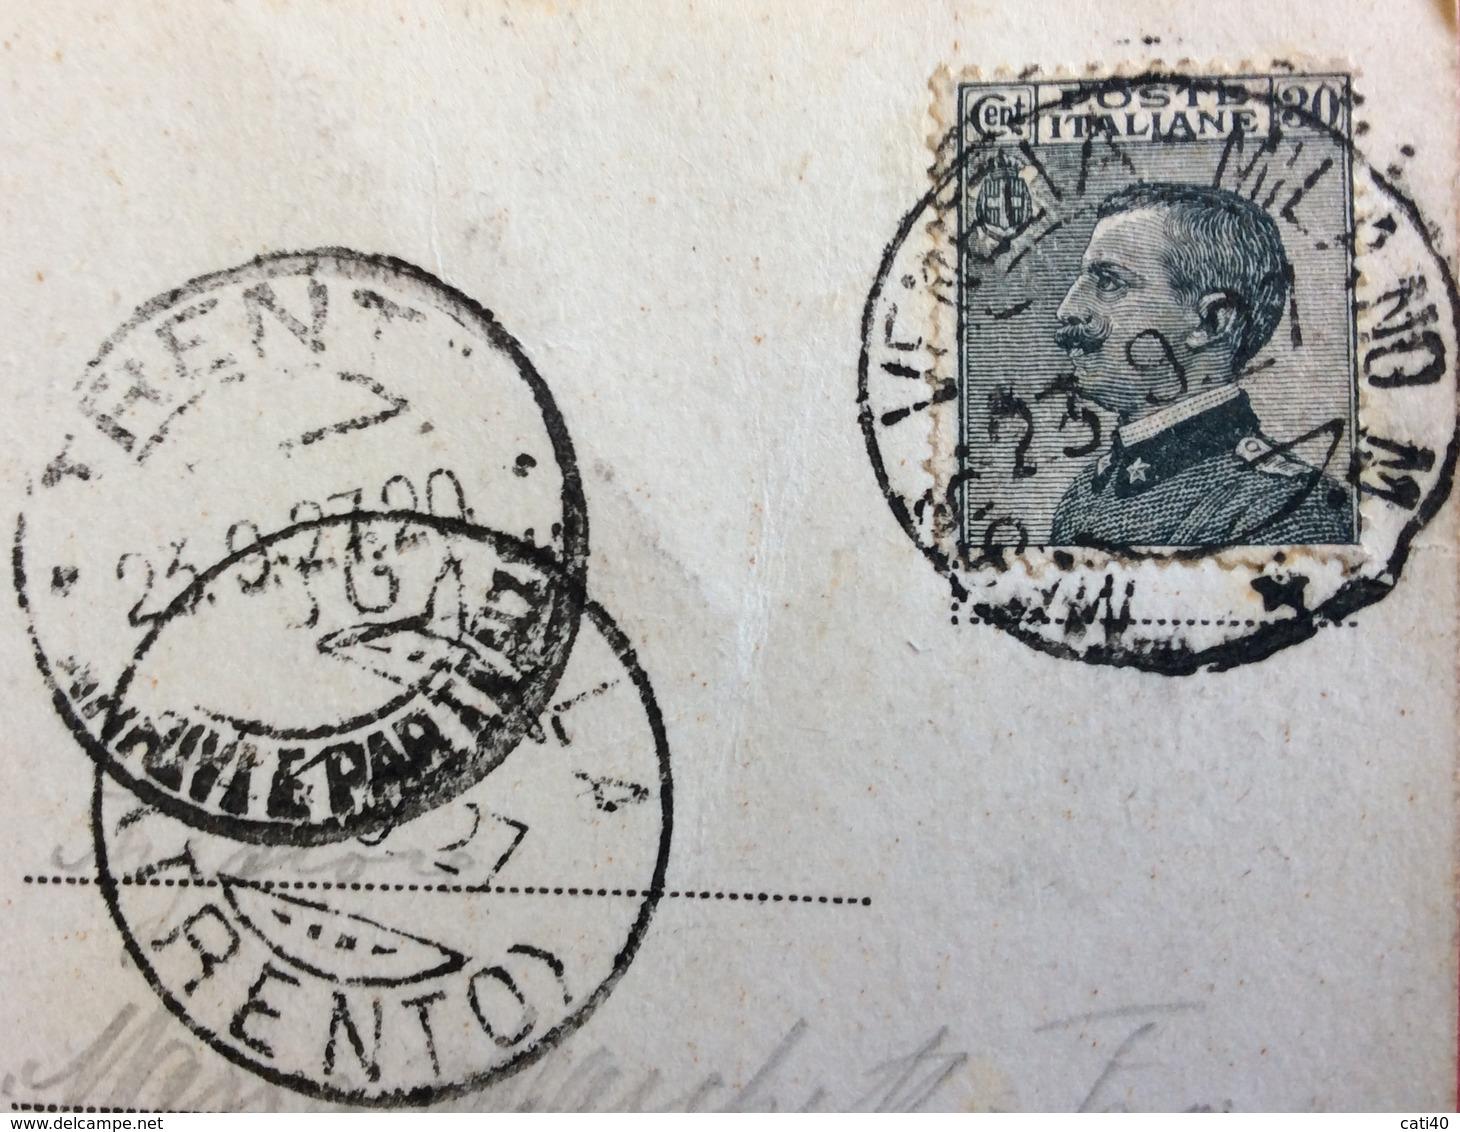 MESSAGGERE VENEZIA - MILANO N.4 Del 23/9/27 + COGNOLA TRENTO   SU CARTOLINA PADOVA BASILICA DI S.ANTONIO - 1900-44 Vittorio Emanuele III